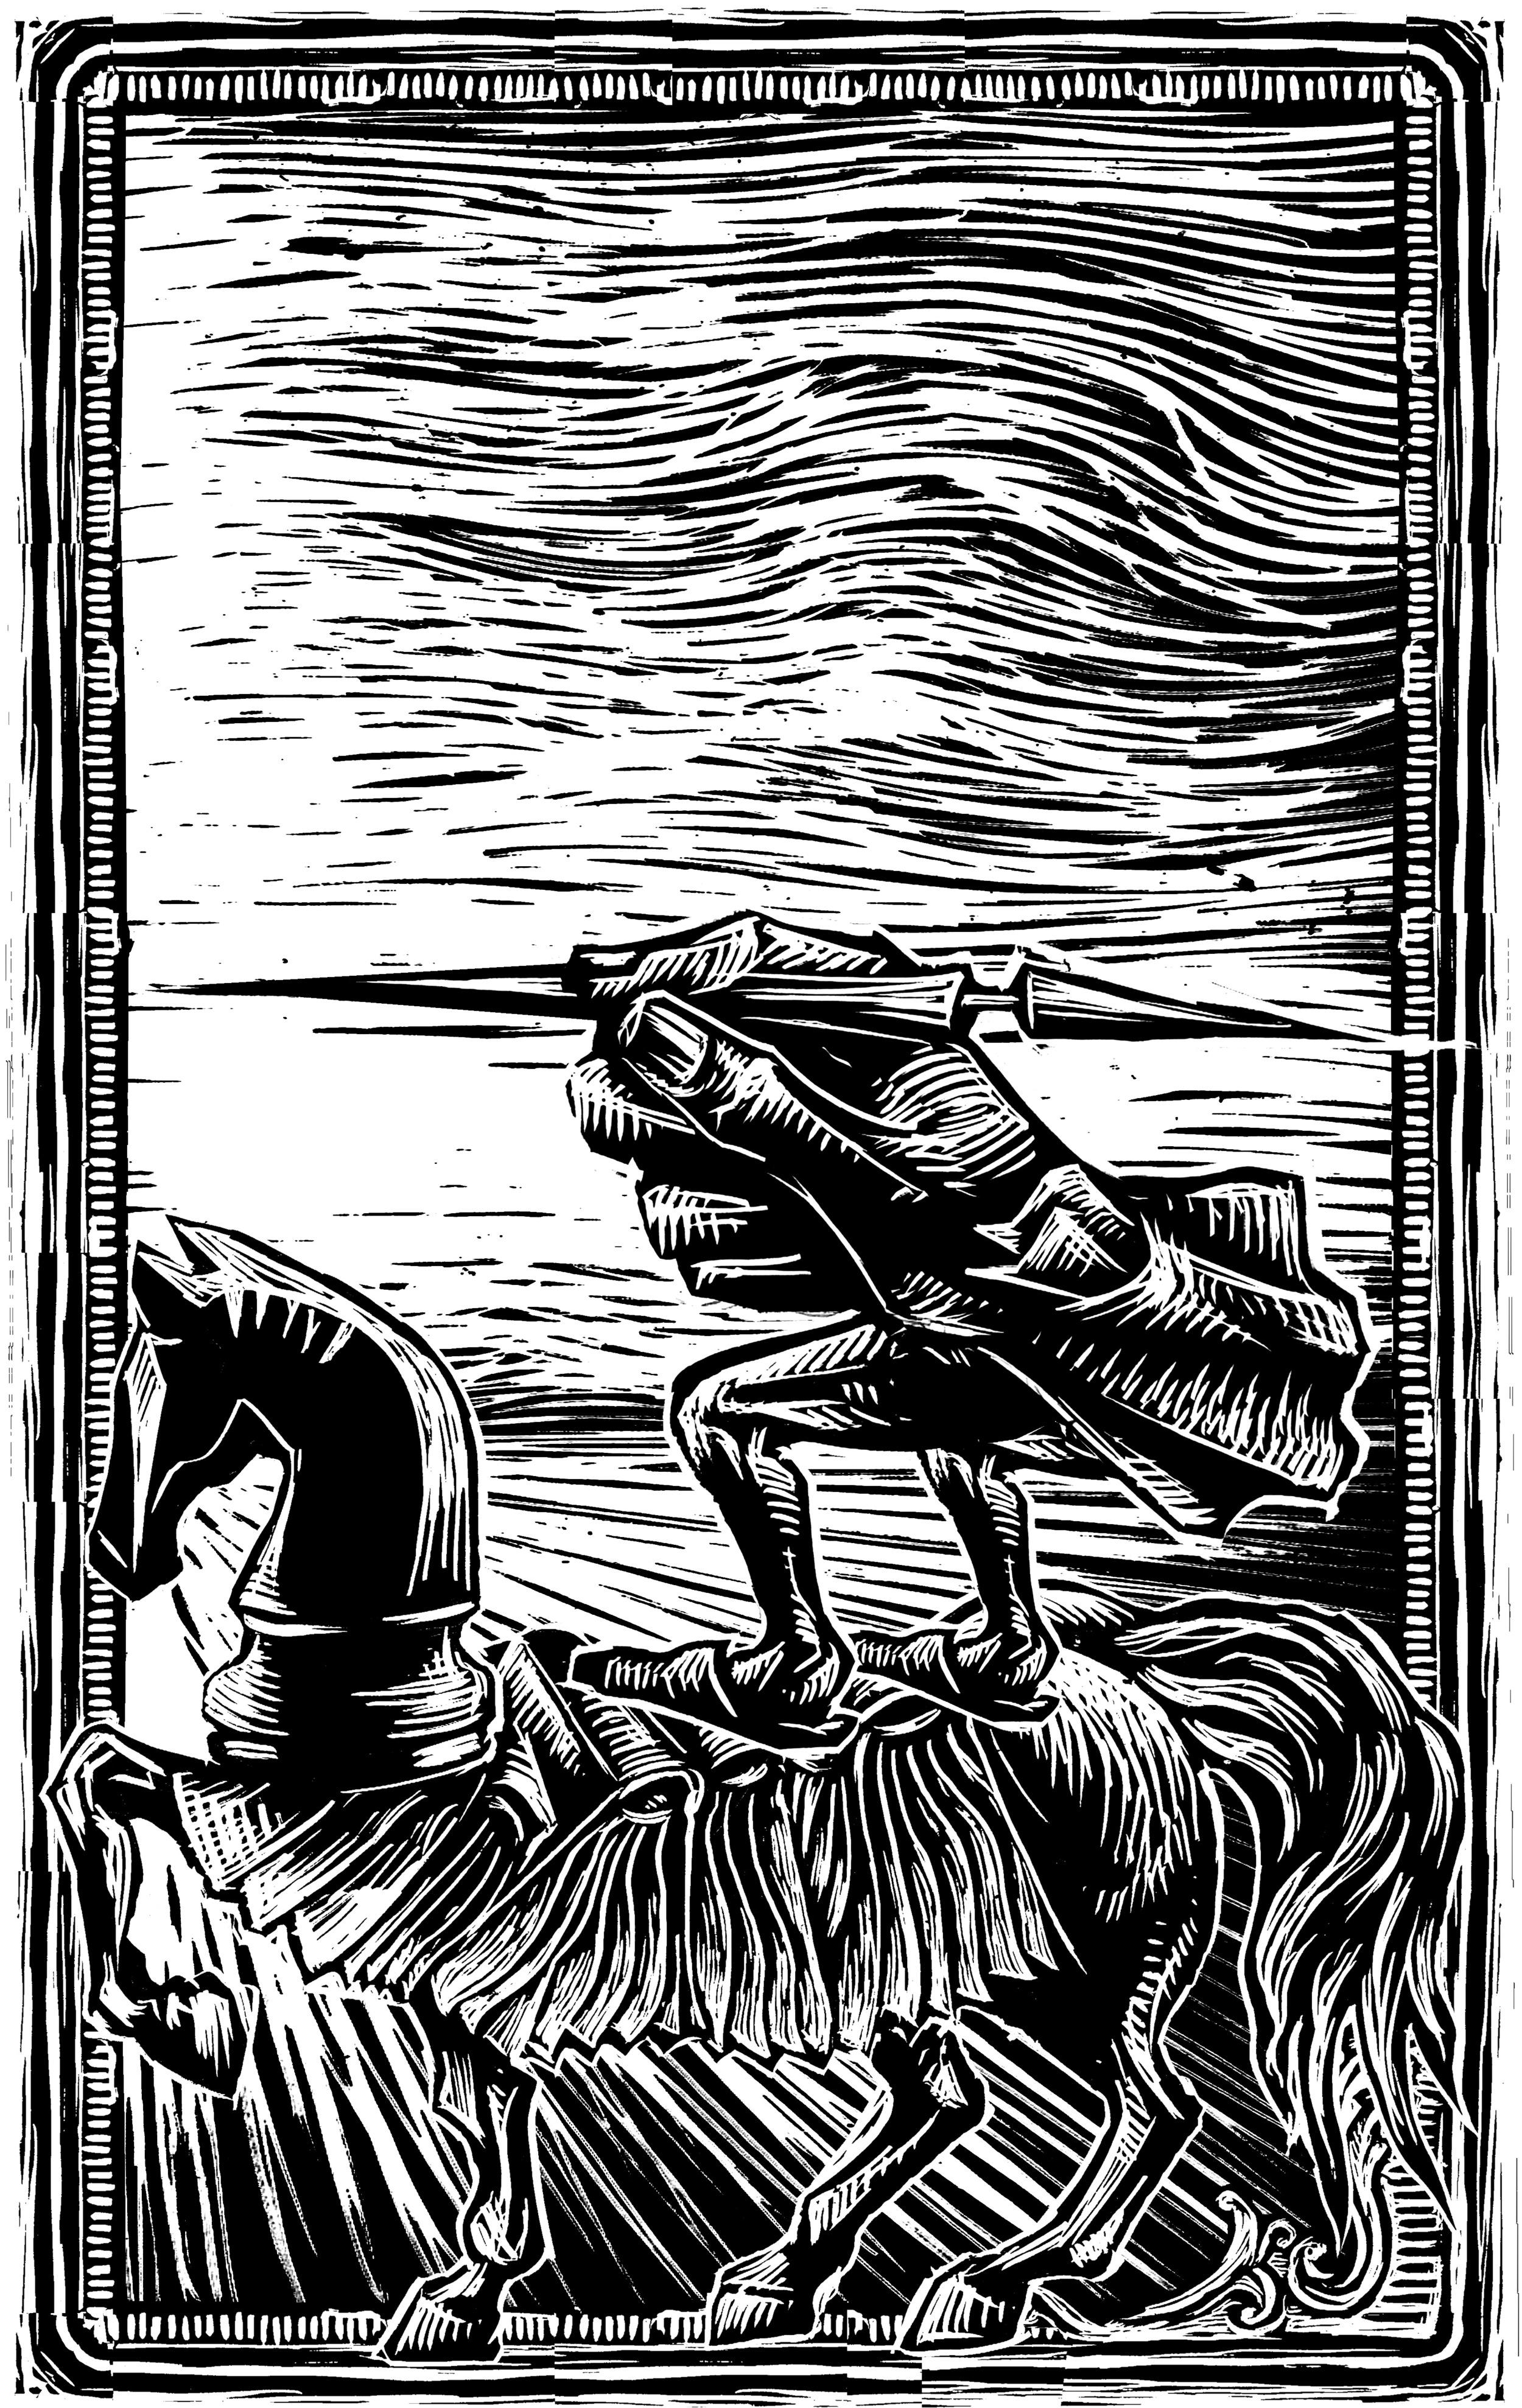 Quijote 13 - Windmills.jpg